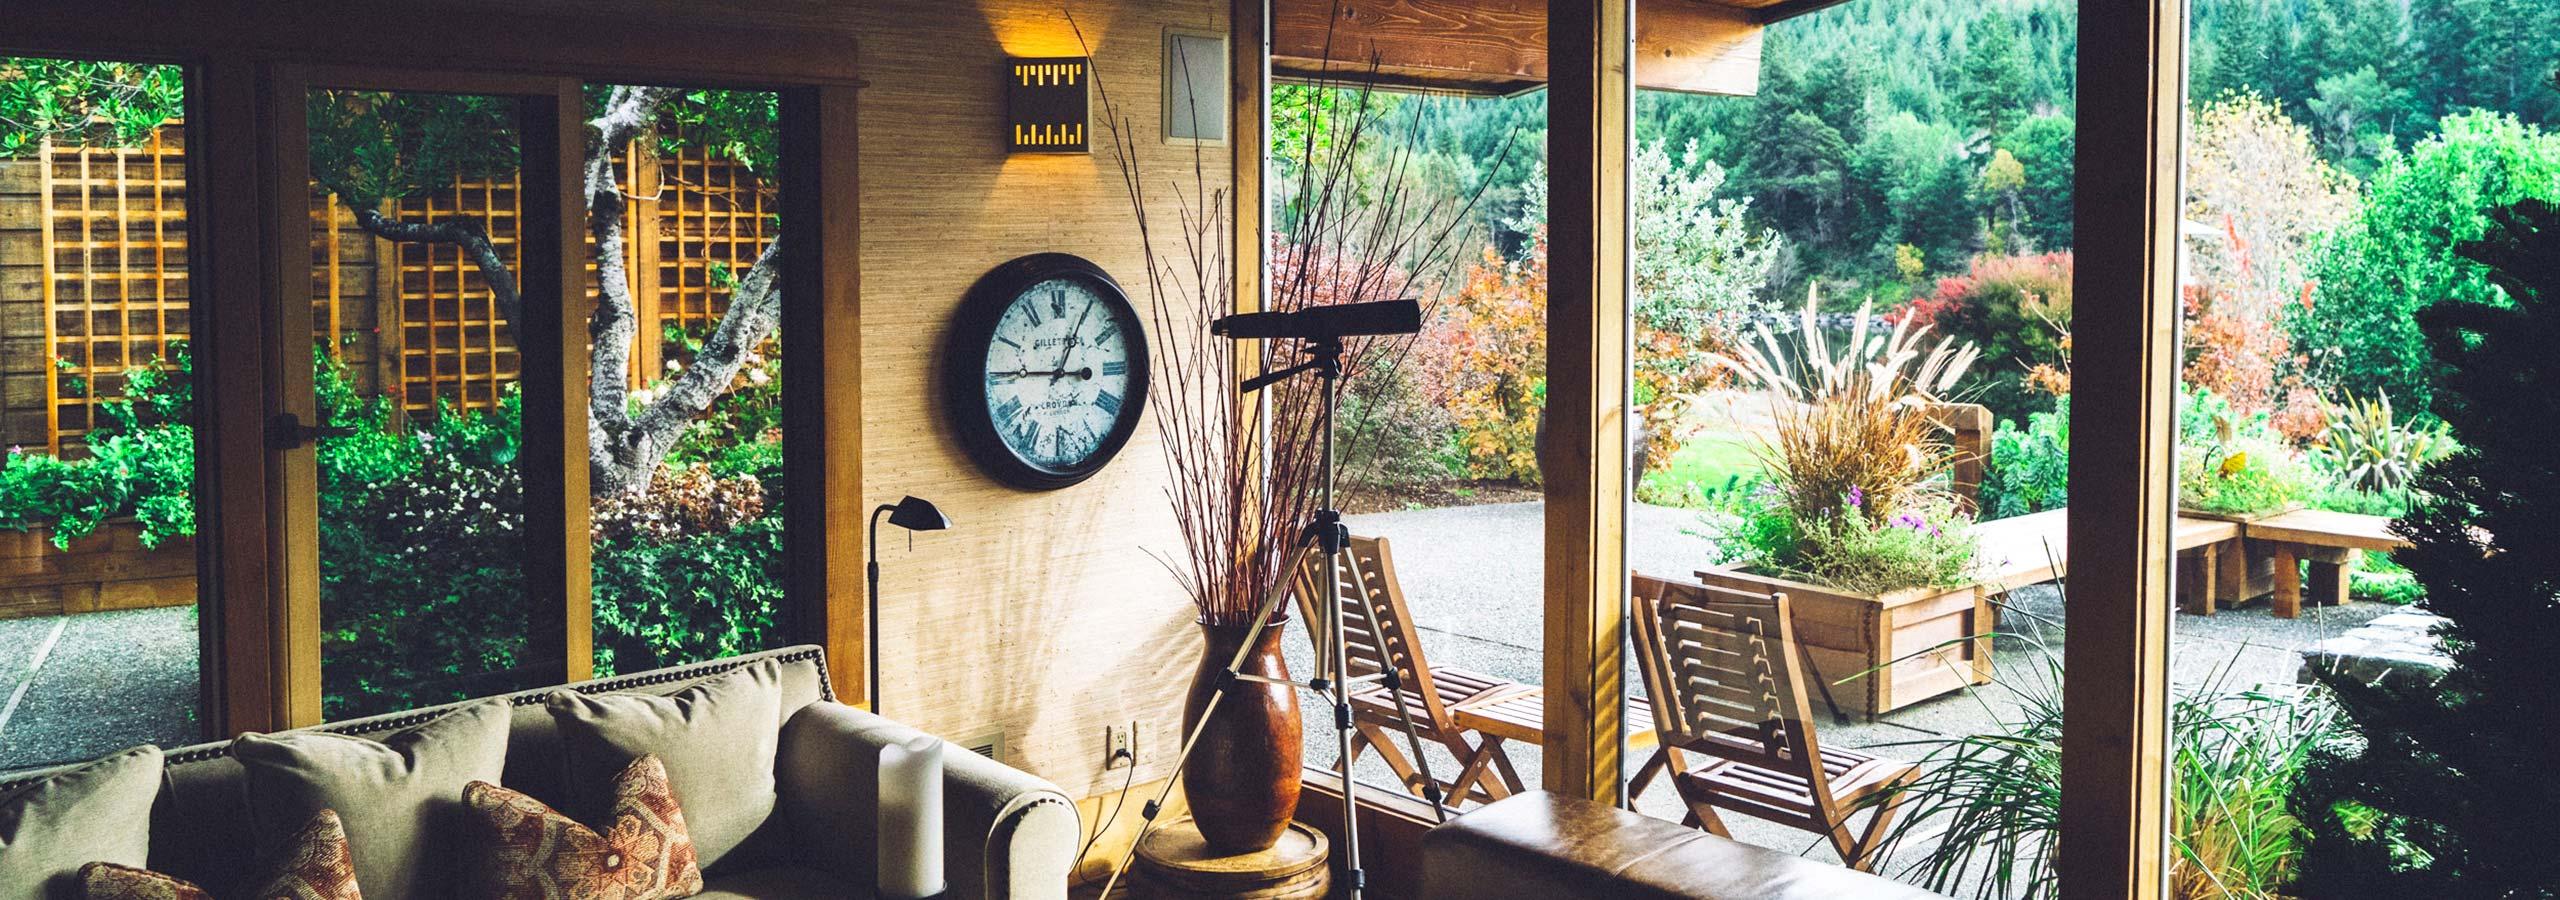 Foto: House, interior, wood and indoor © Joshua Ness / Unsplash - https://unsplash.com/photos/Vo52cKzOxMY